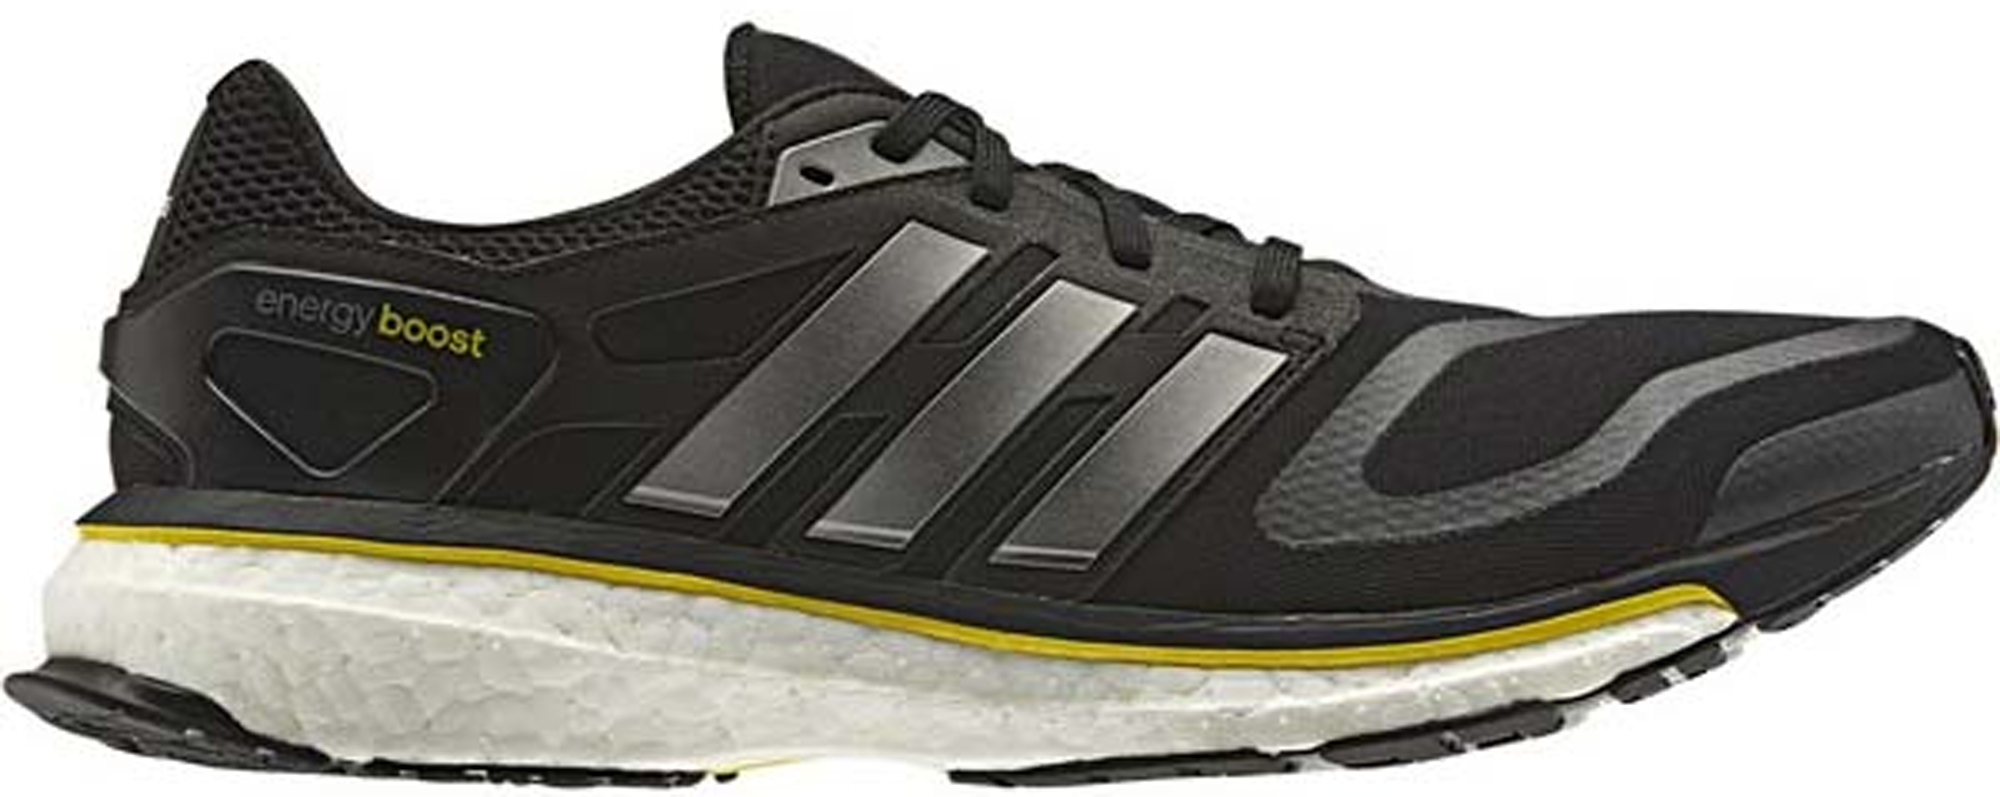 adidas Energy Boost OG 5th Anniversary